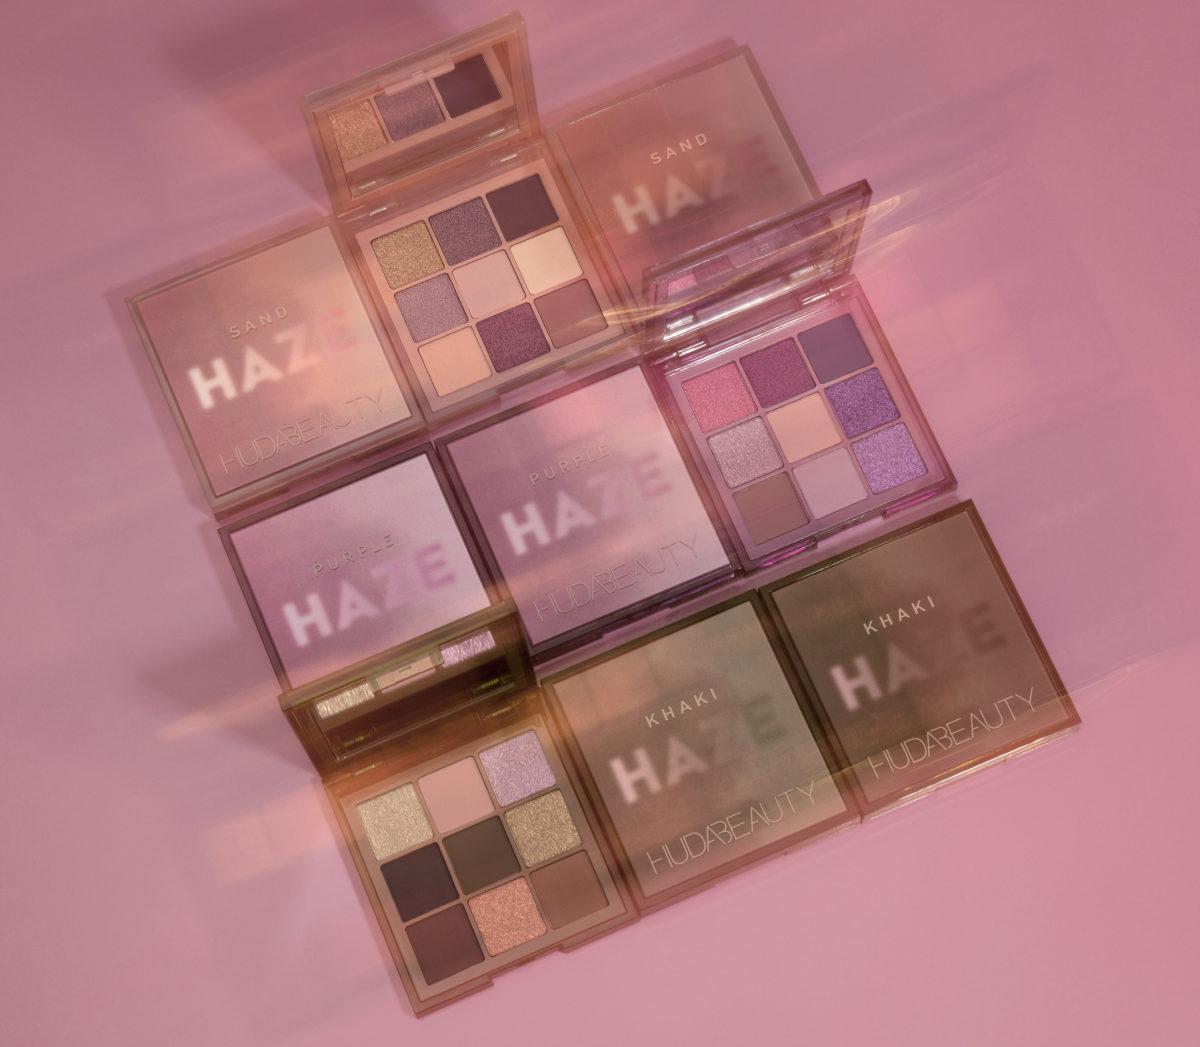 Huda Beauty Haze obsessions